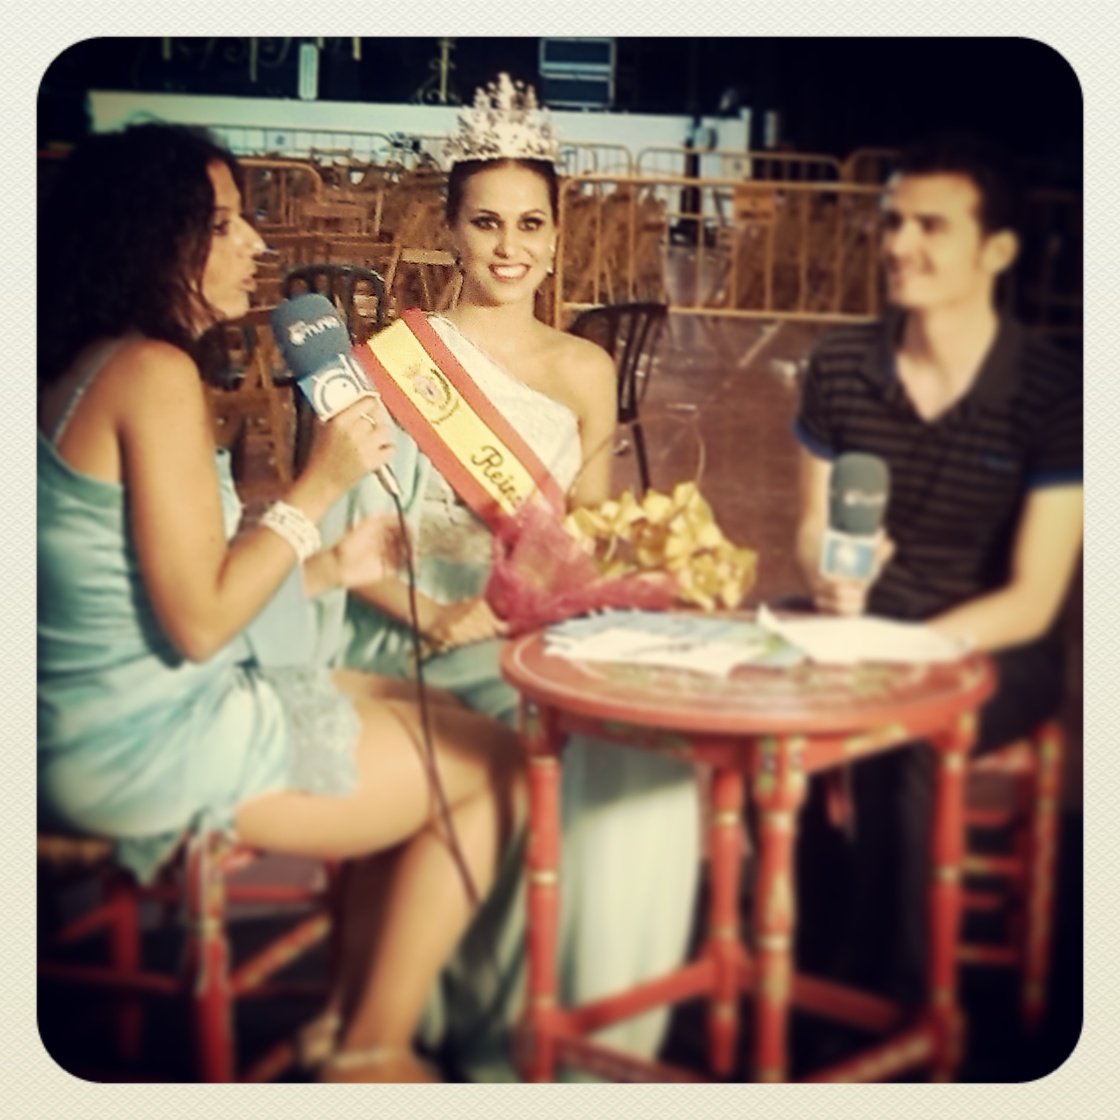 nerea-baena-fernandez-reina-feria-estepa-2014-fiestas